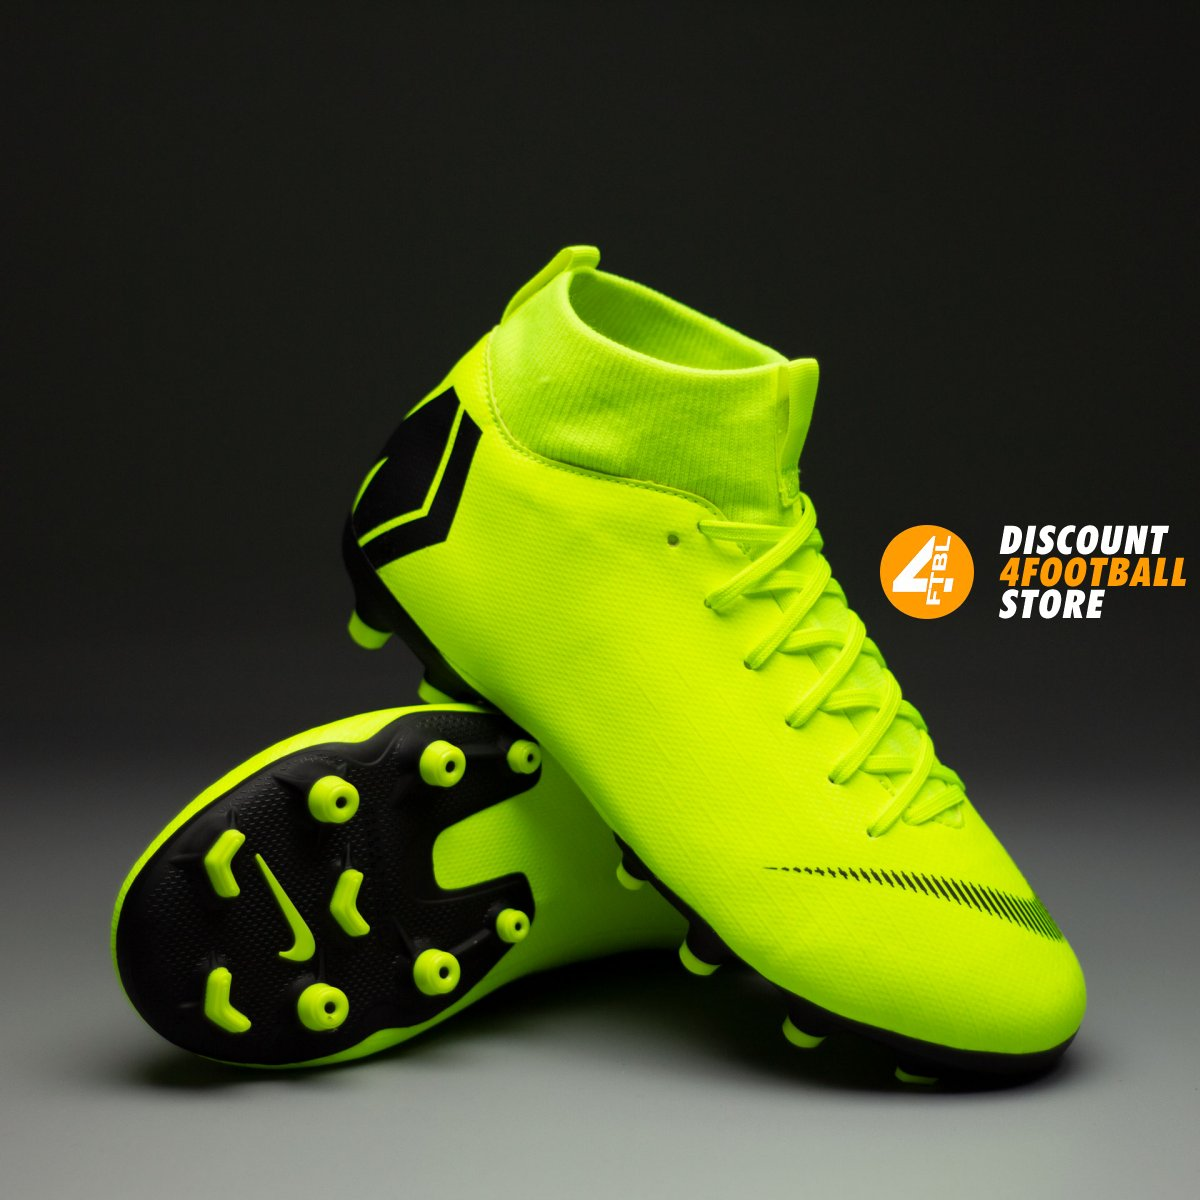 Детские бутсы Nike Mercurial Superfly Academy AH7337-701 558be0f104707